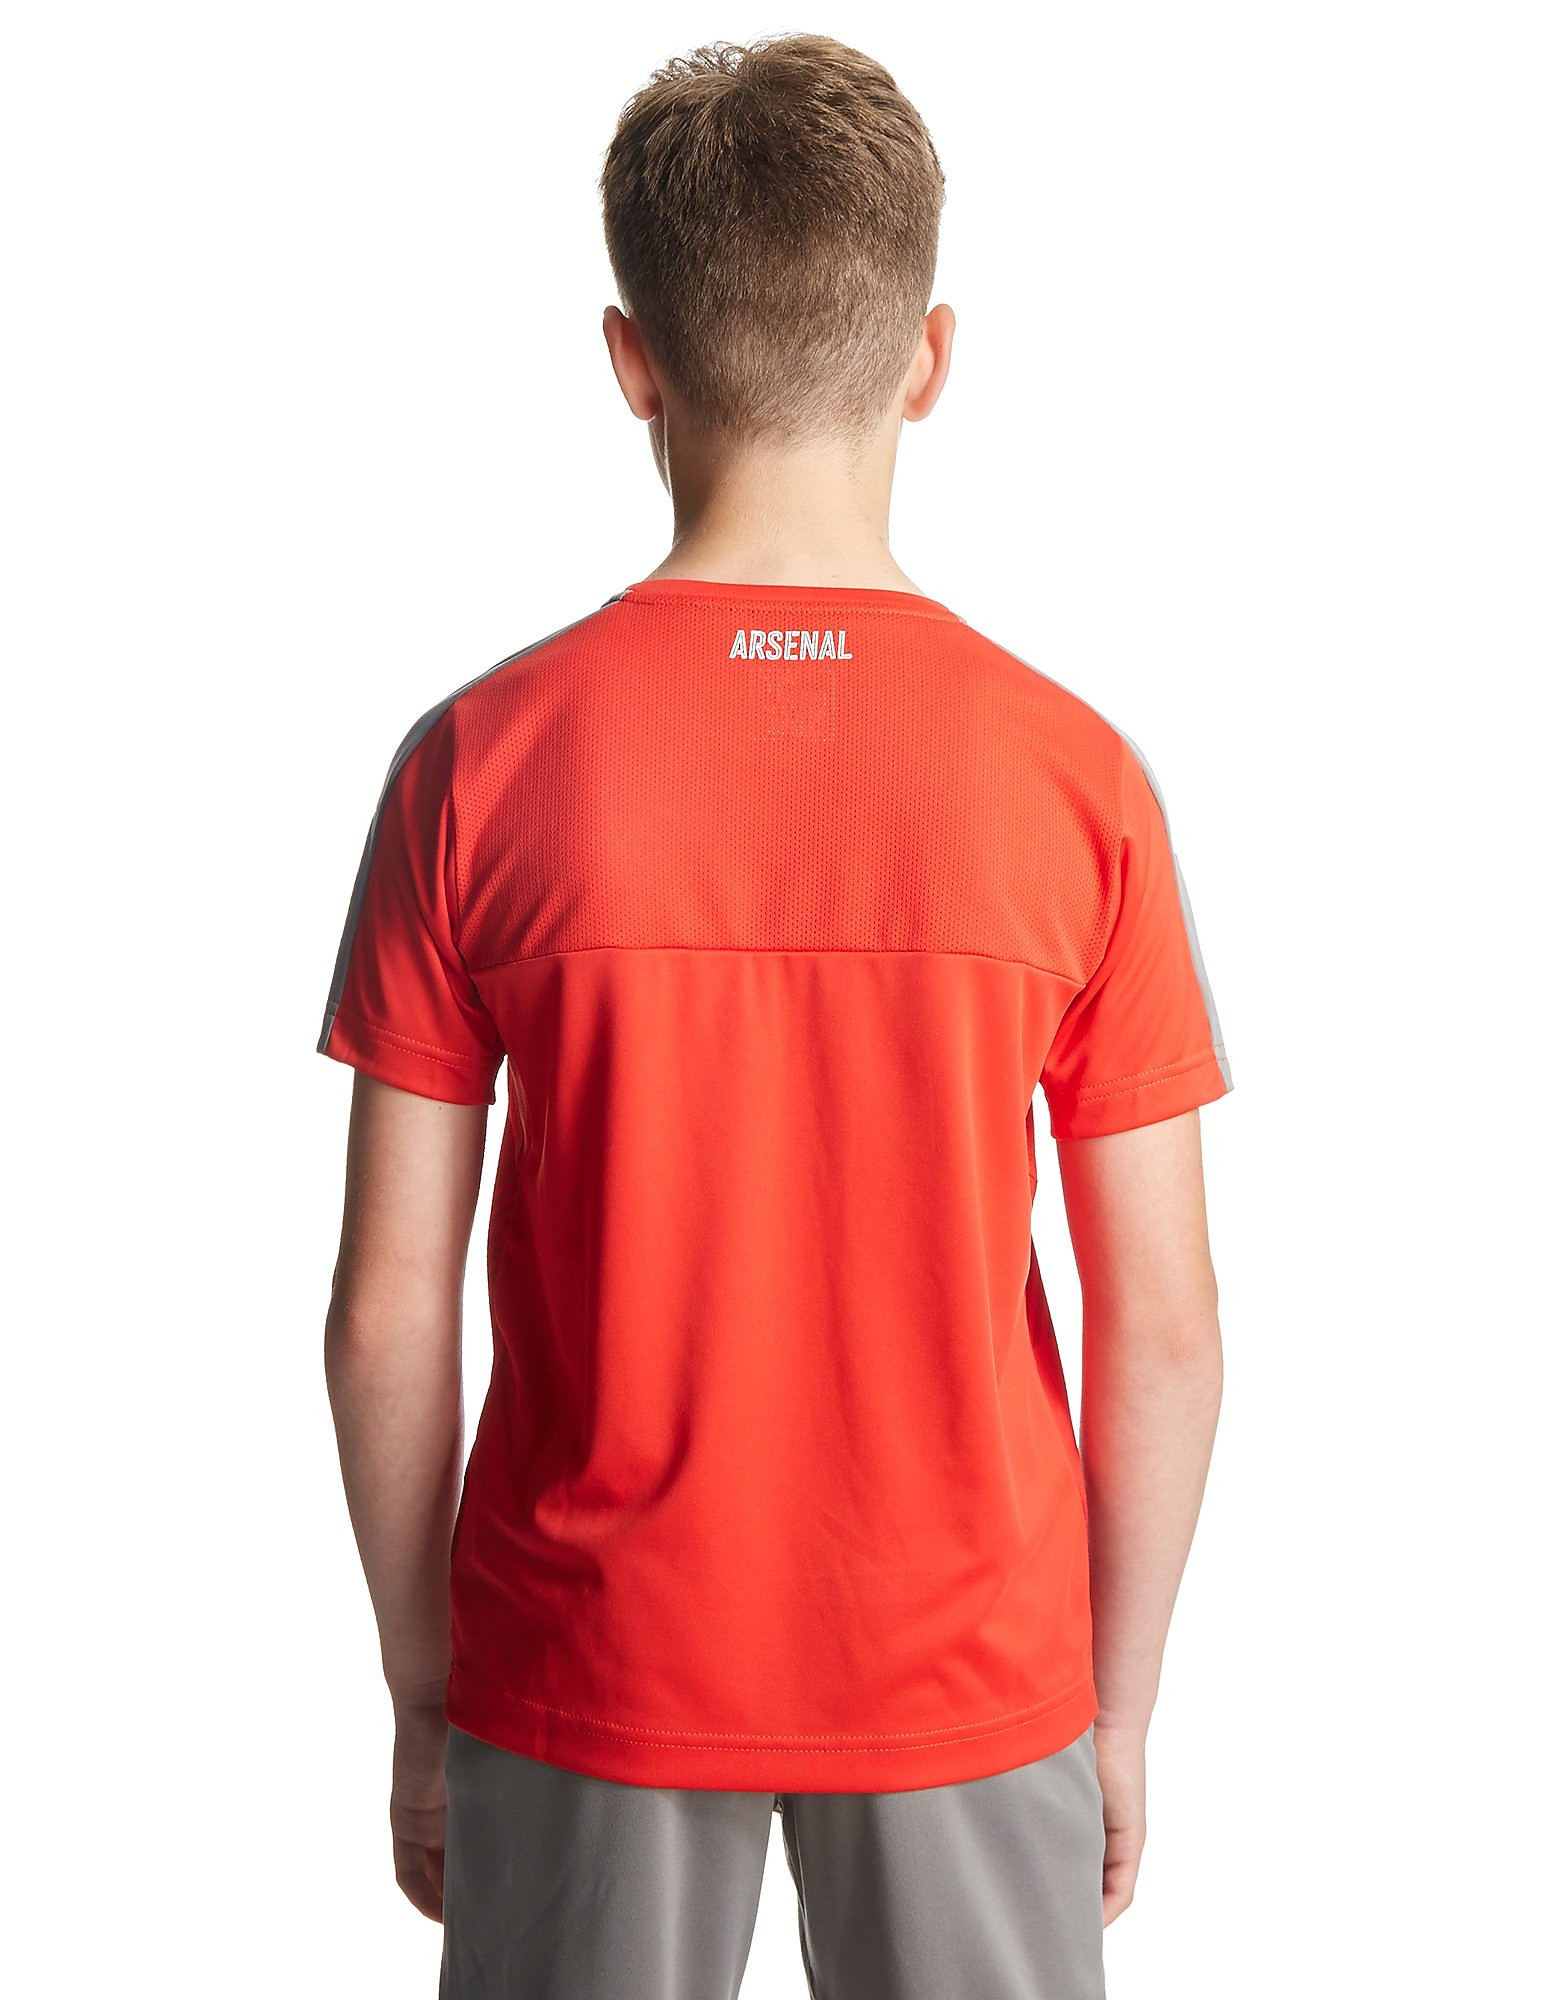 PUMA Arsenal 2016/17 Training Shirt Junior